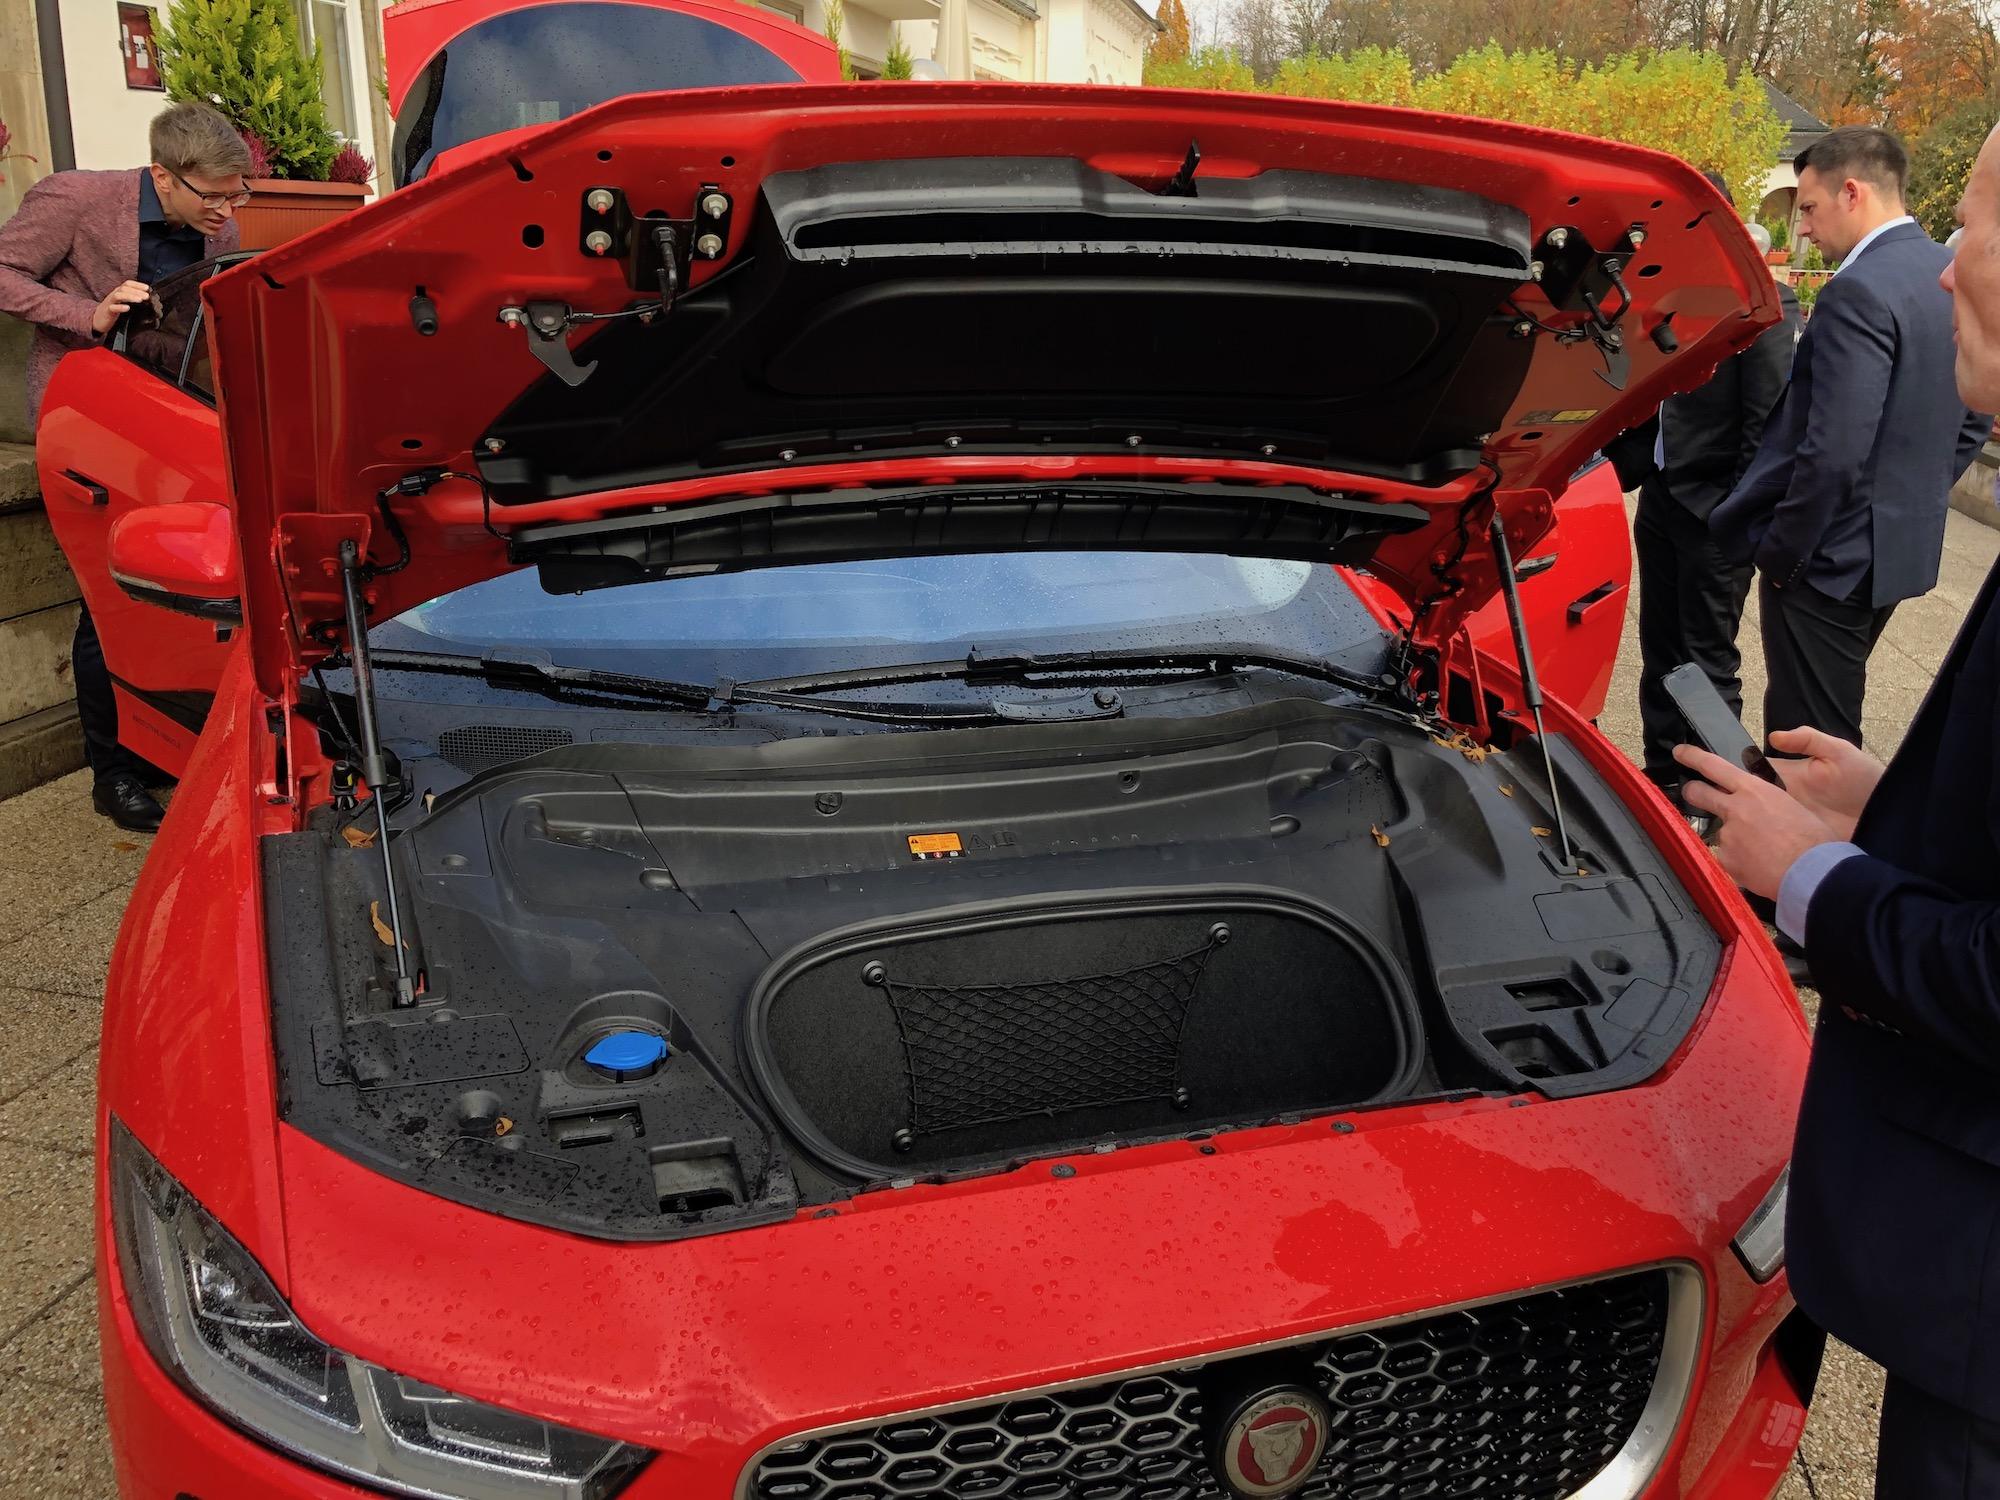 Jaguar Ipace Close Up The Last Driver License Holder